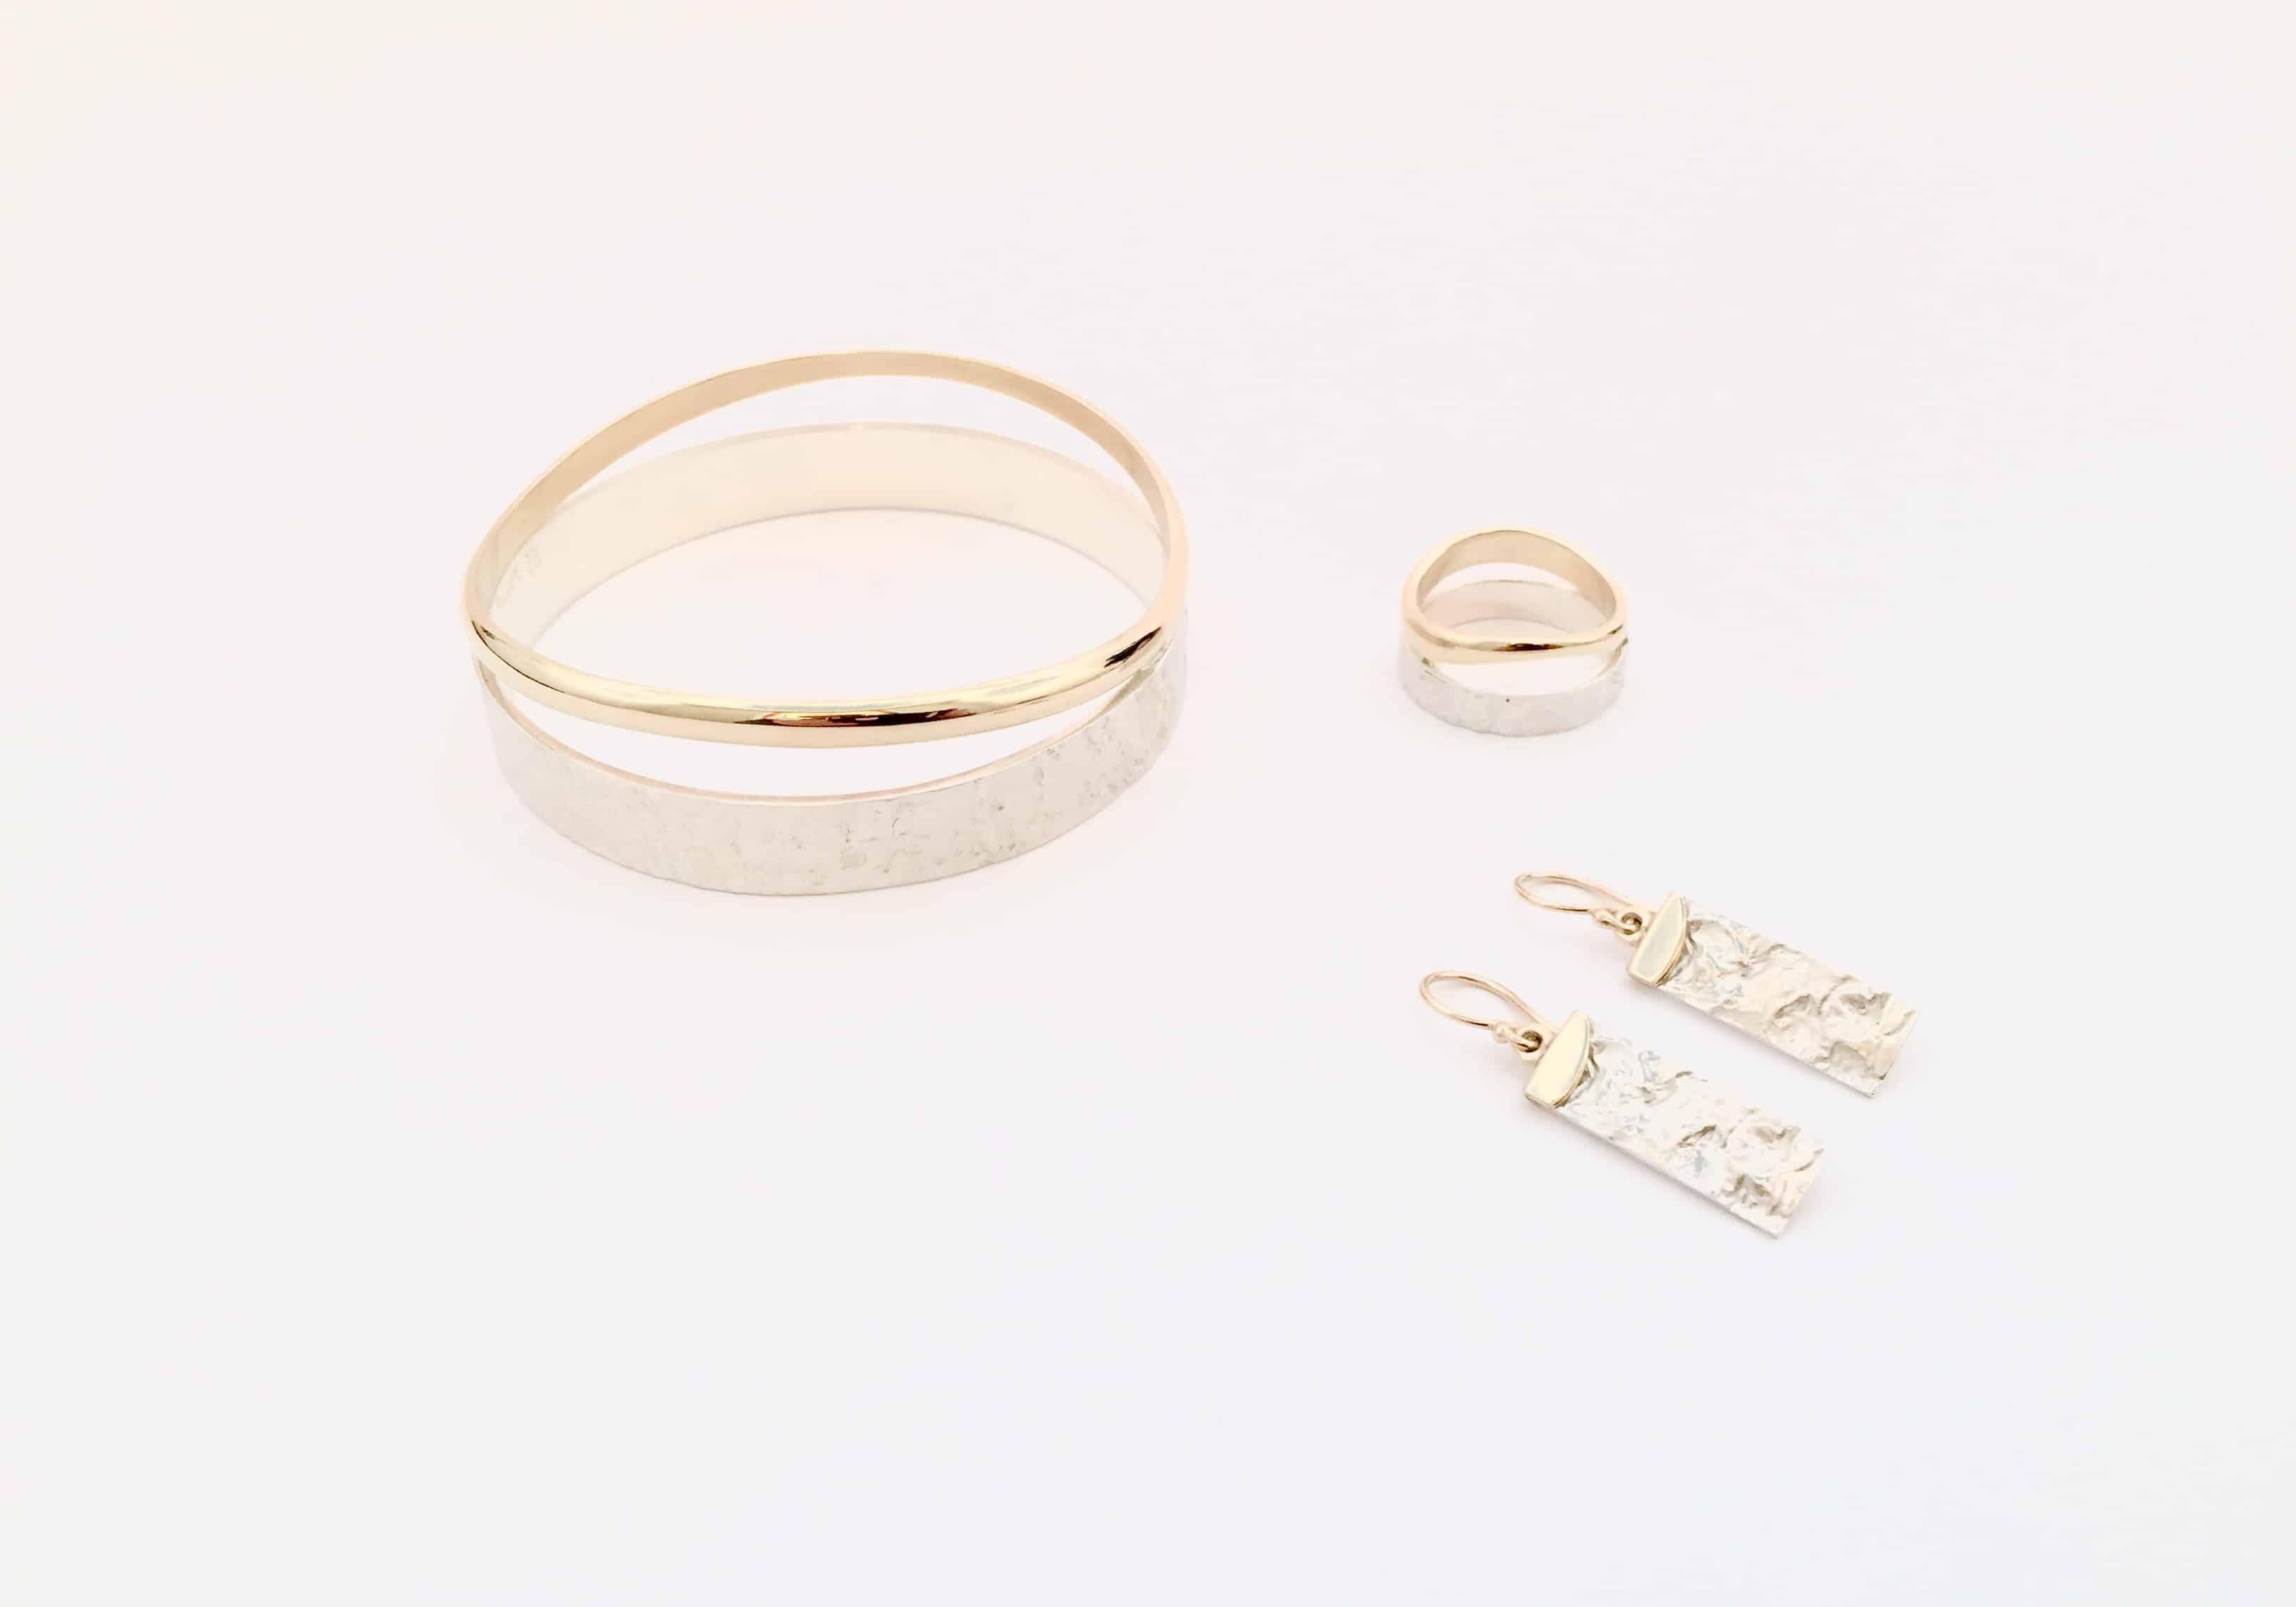 Francois-Payet-bangle-ring-earrings